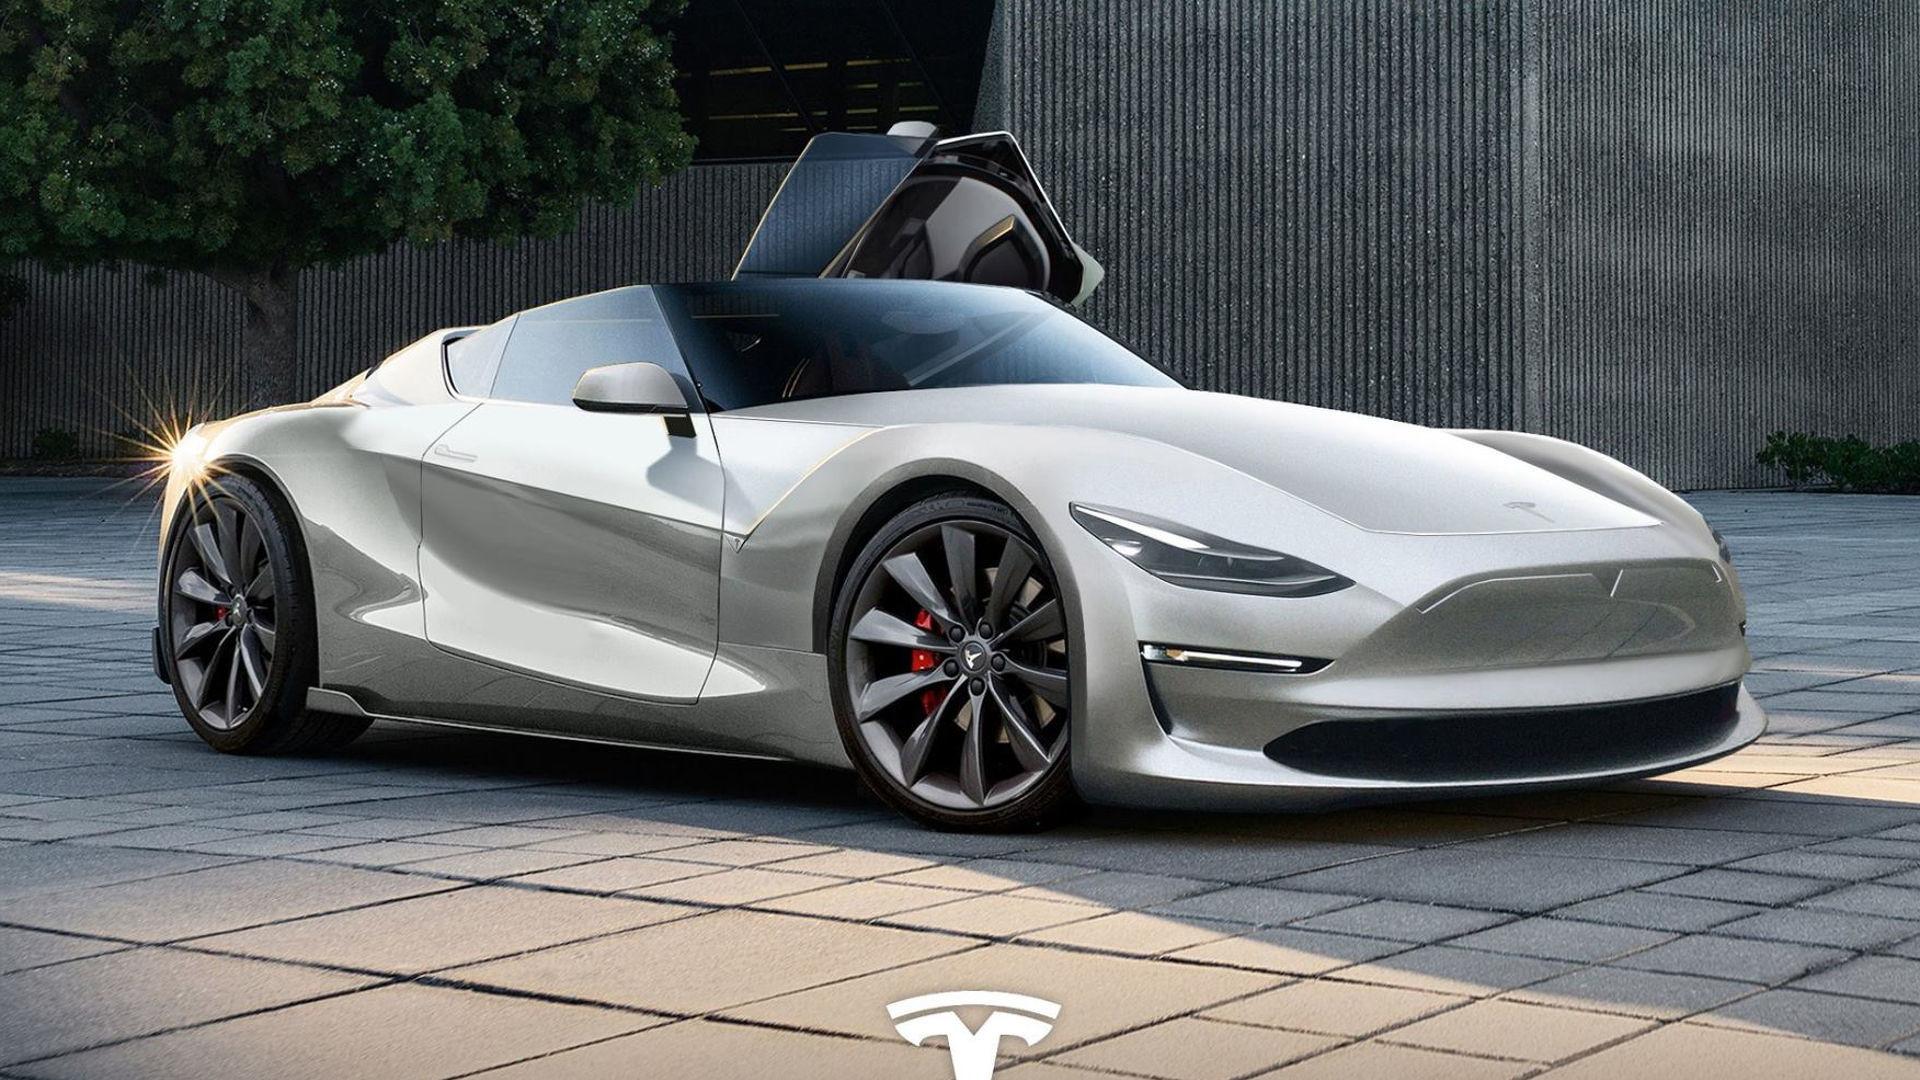 Tesla 2019 >> We Hope The 2019 Tesla Roadster Looks This Good